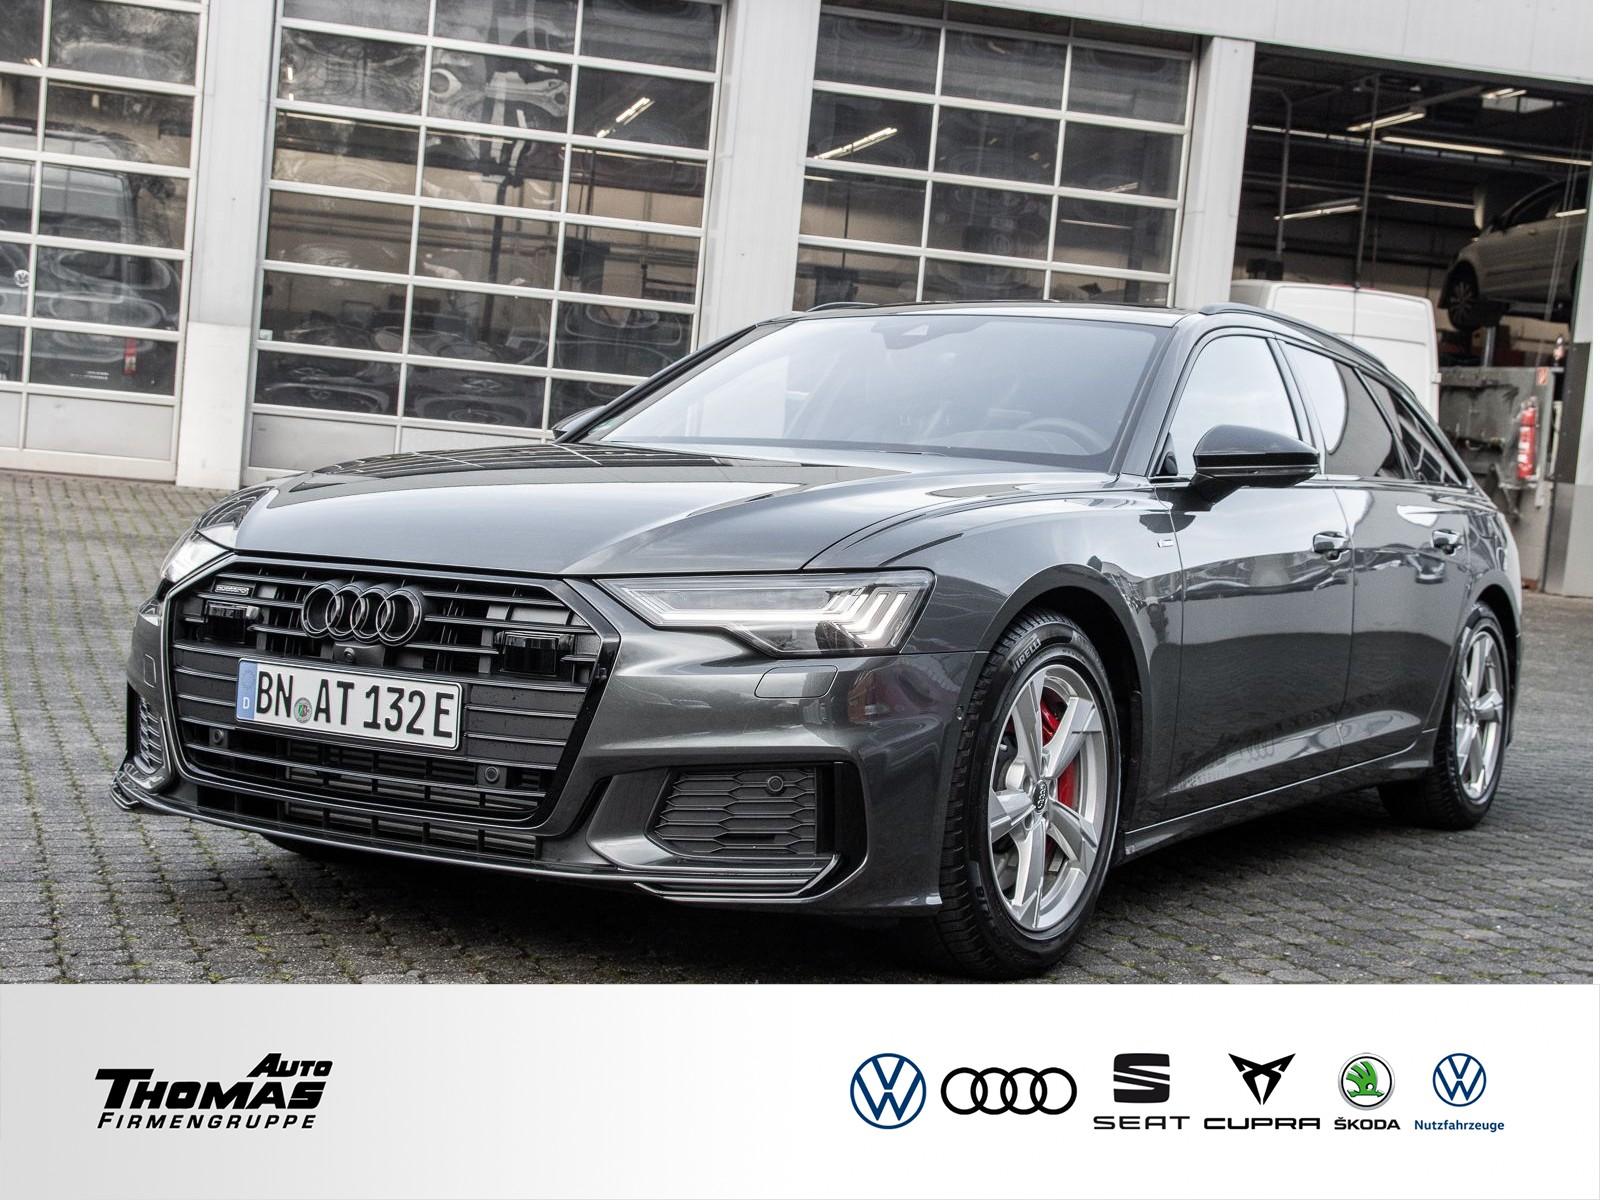 Audi A6 Avant sport 55 TFSI e quattro S line PANO+LED, Jahr 2020, Hybrid